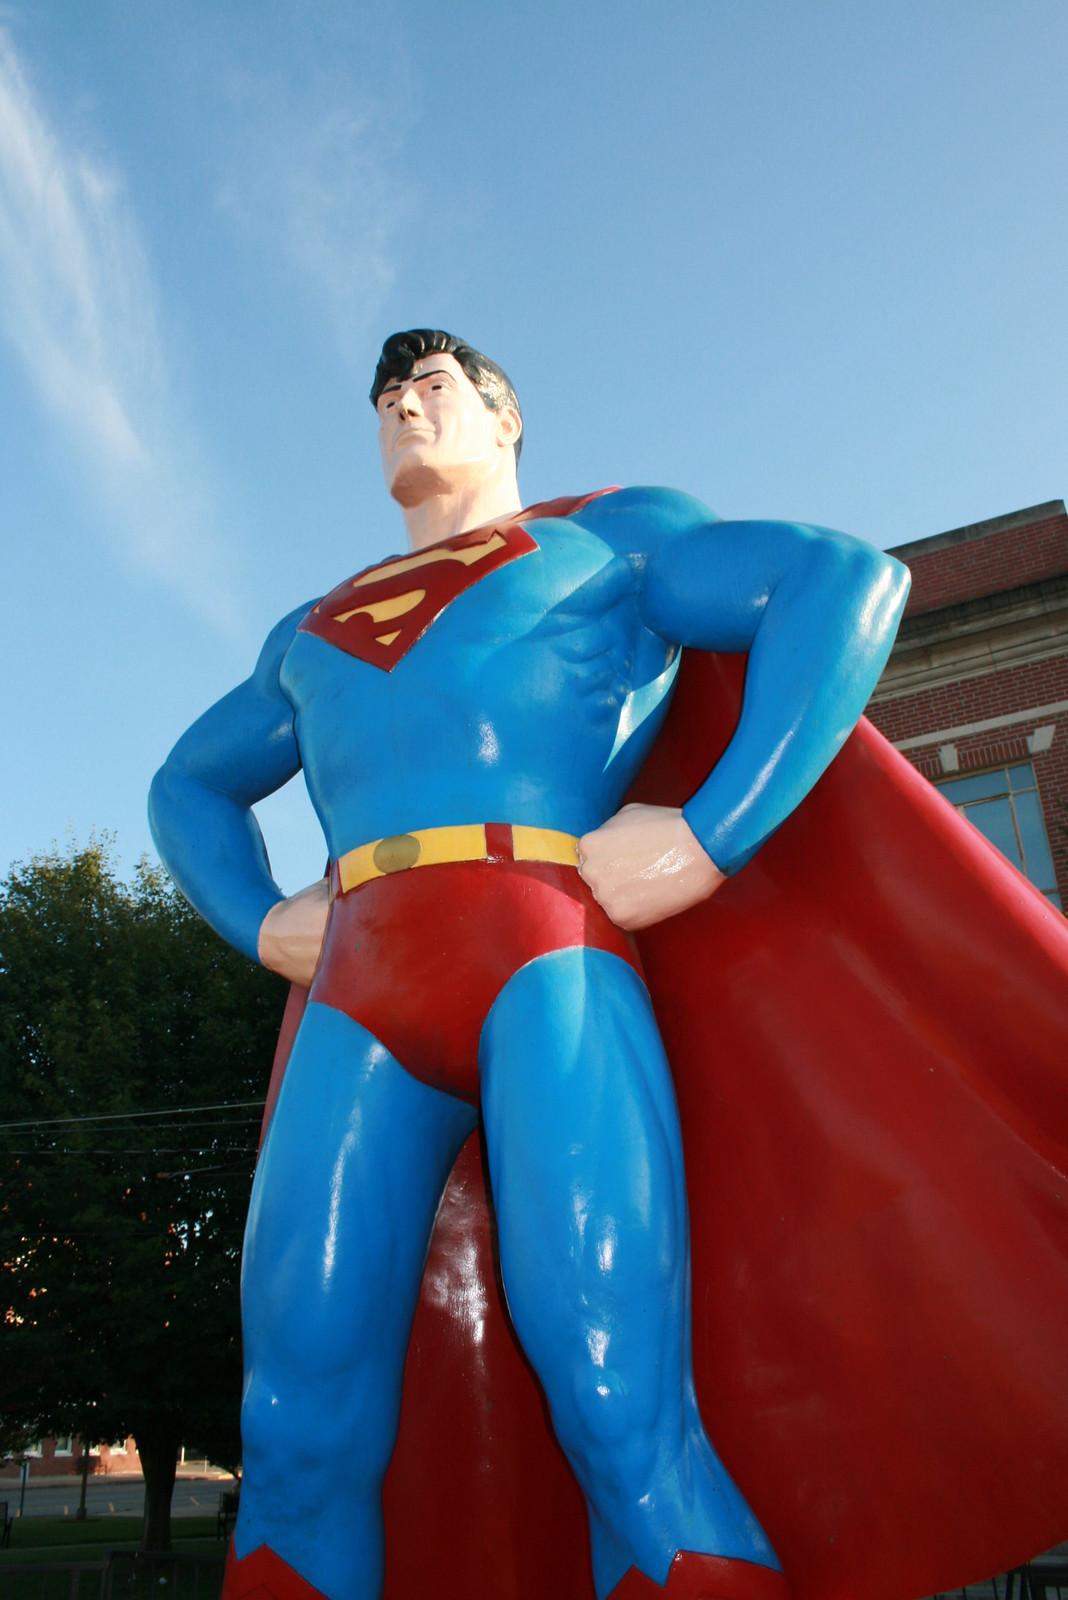 Superman Statue in Metropolis, Illinois